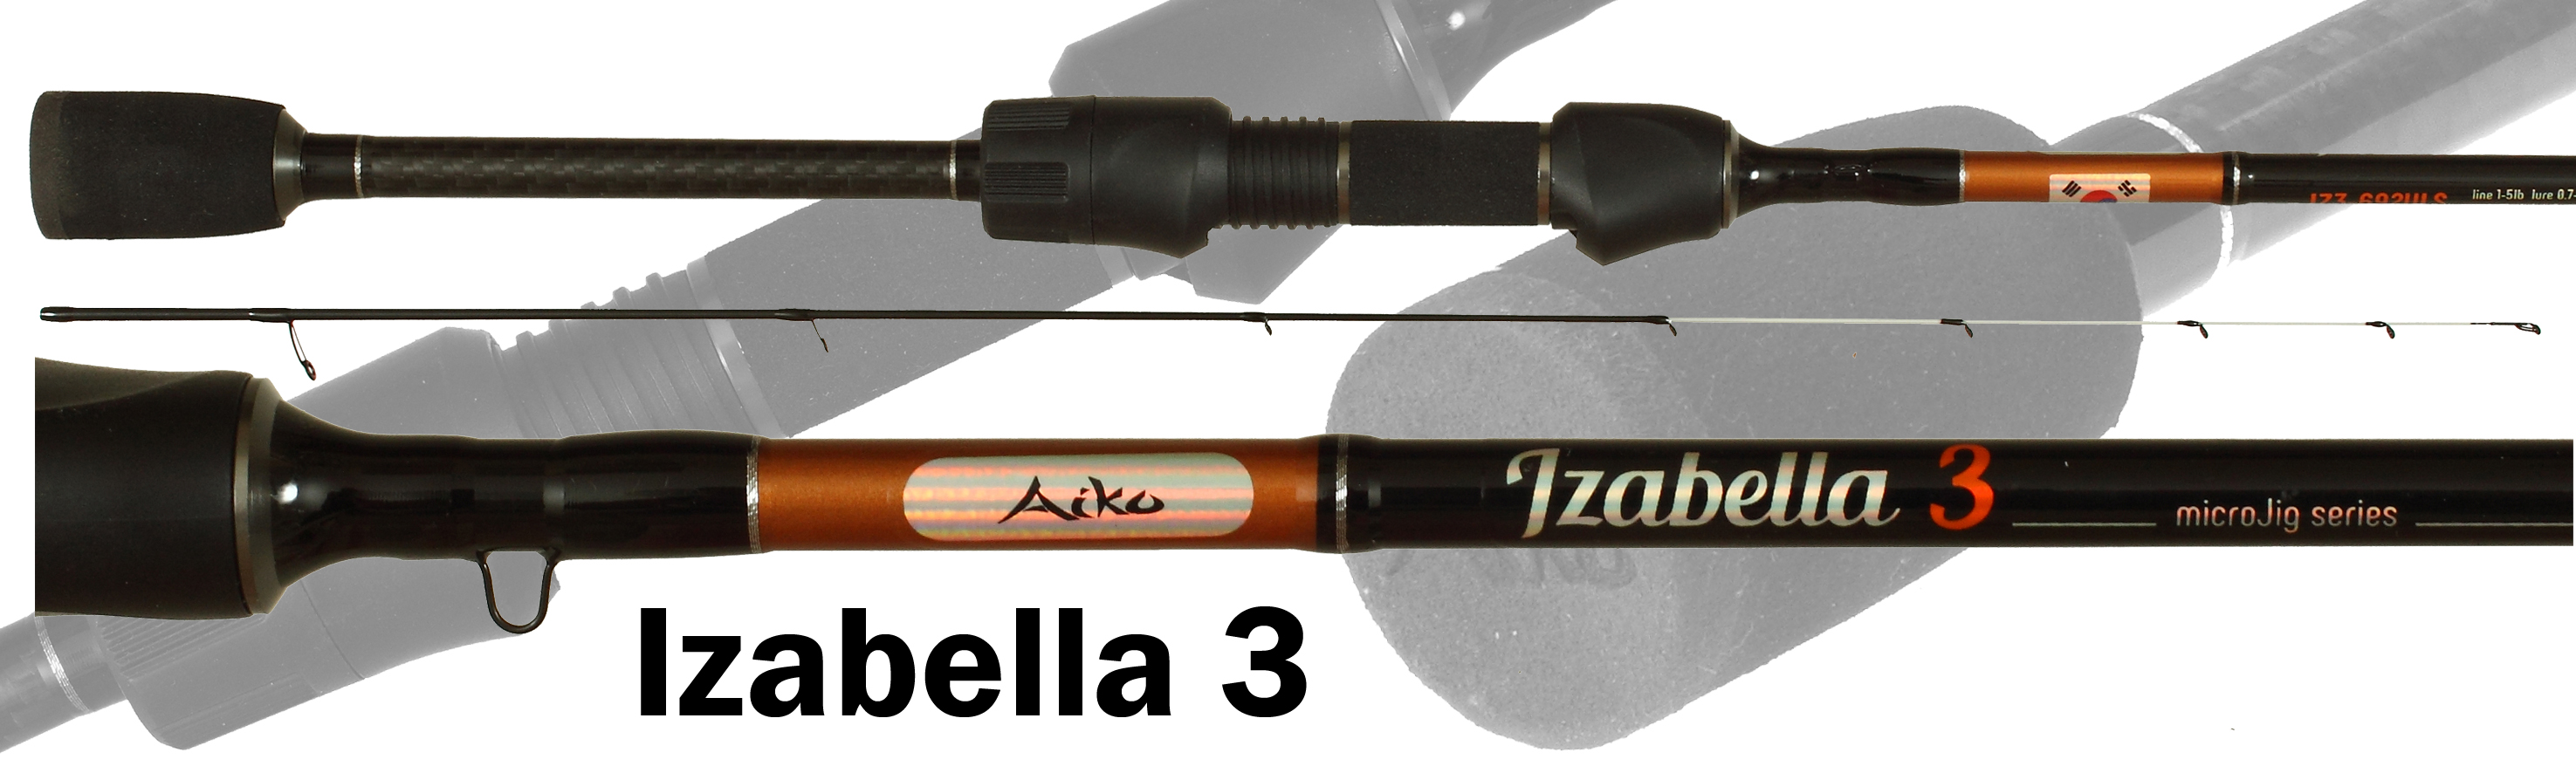 Izabella 3-1